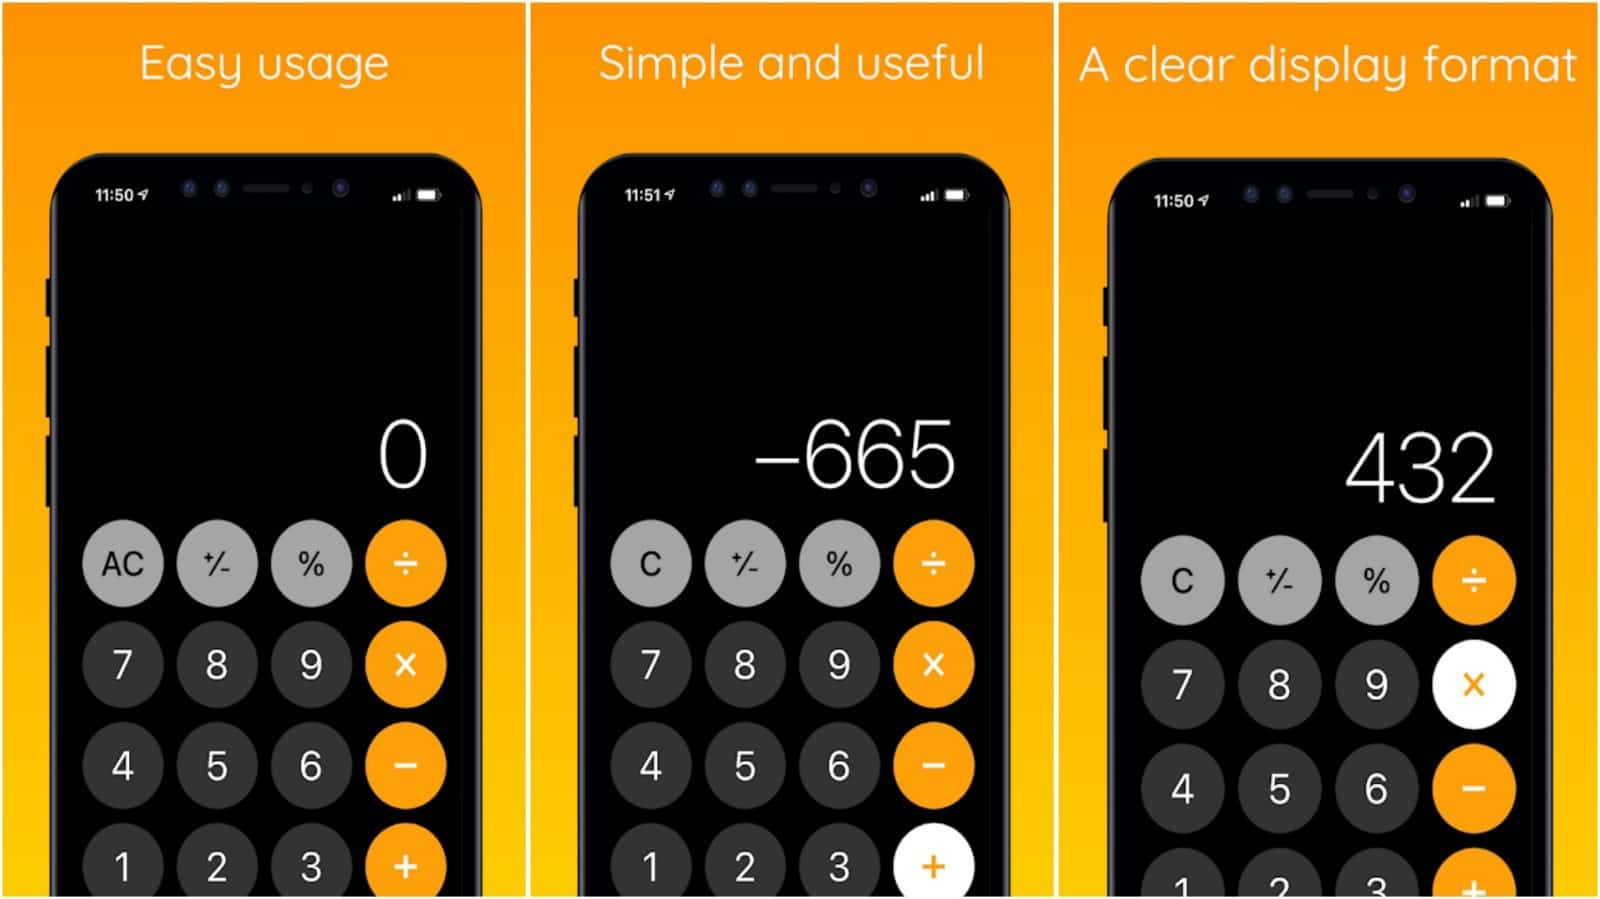 iCalculator app grid image